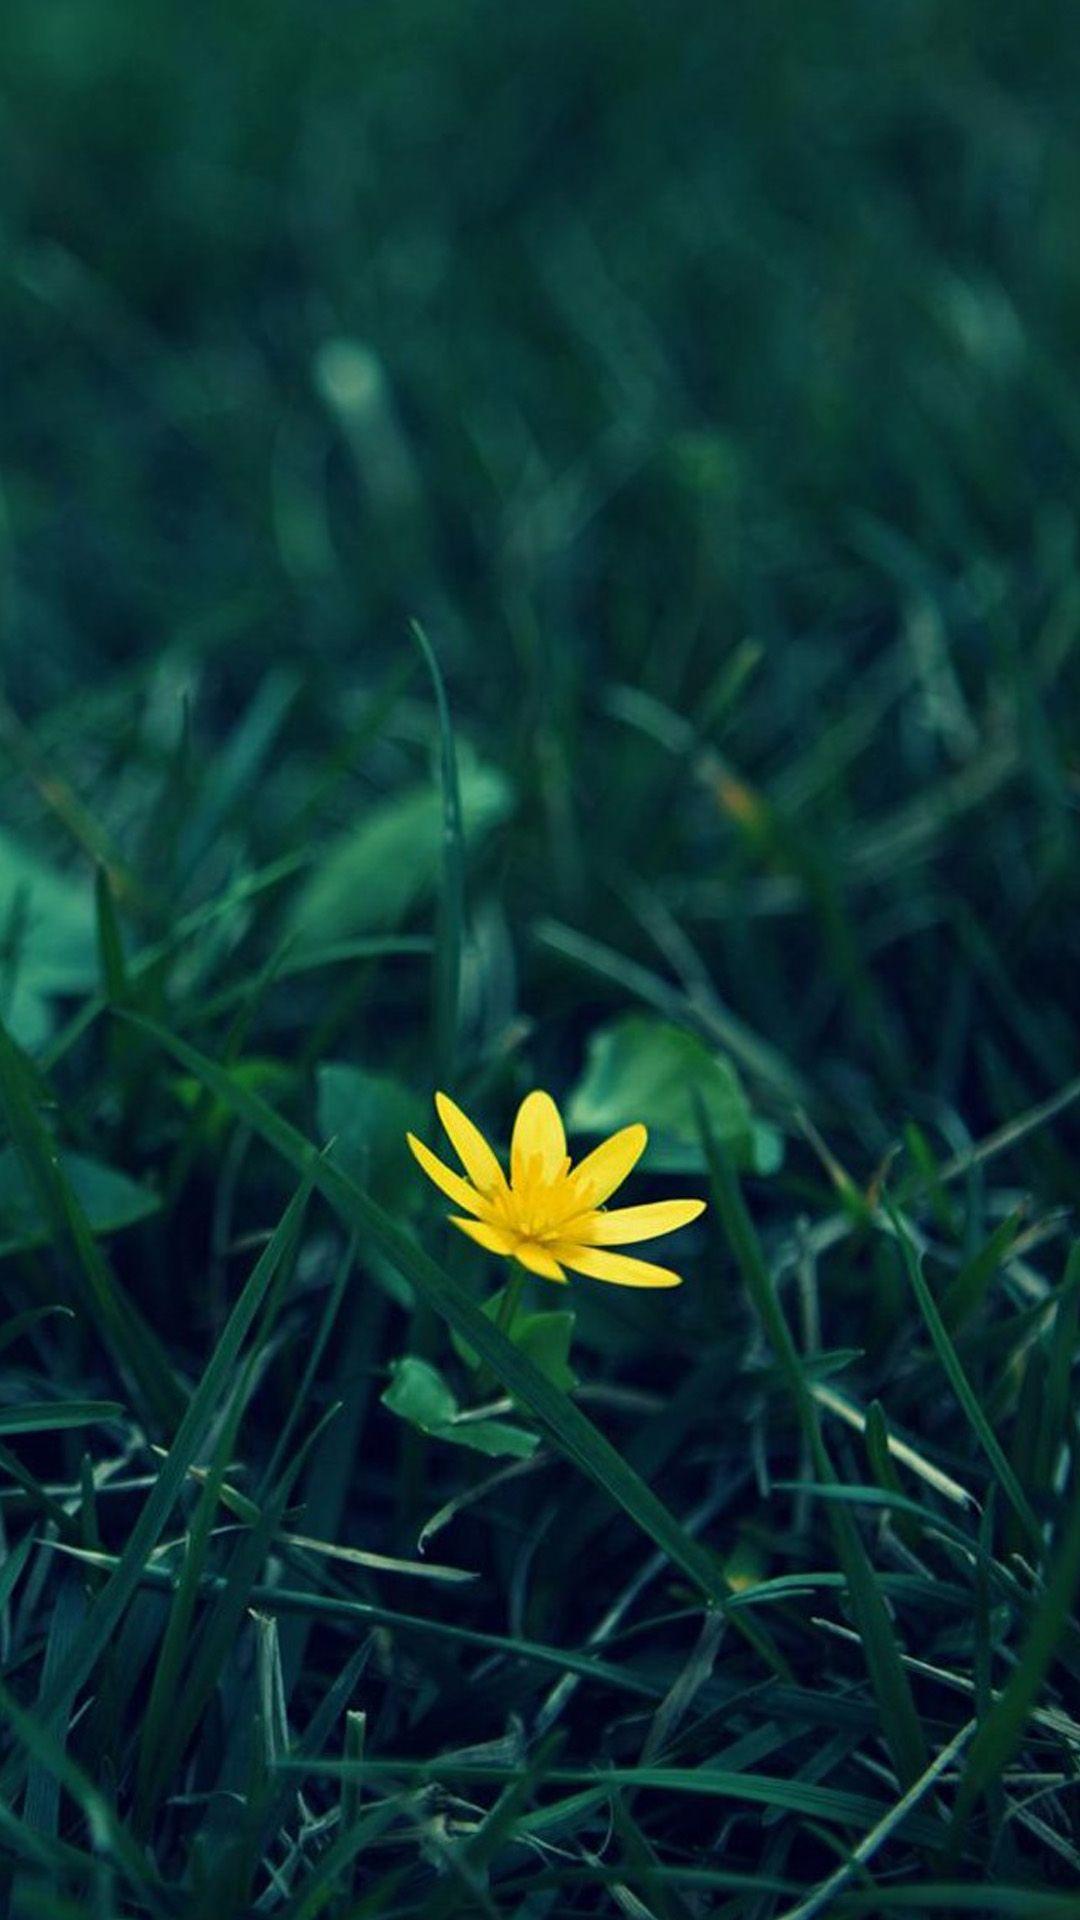 Nature Little Yellow Flower Green Grassland Blur Background IPhone 6 Pluswallpaper